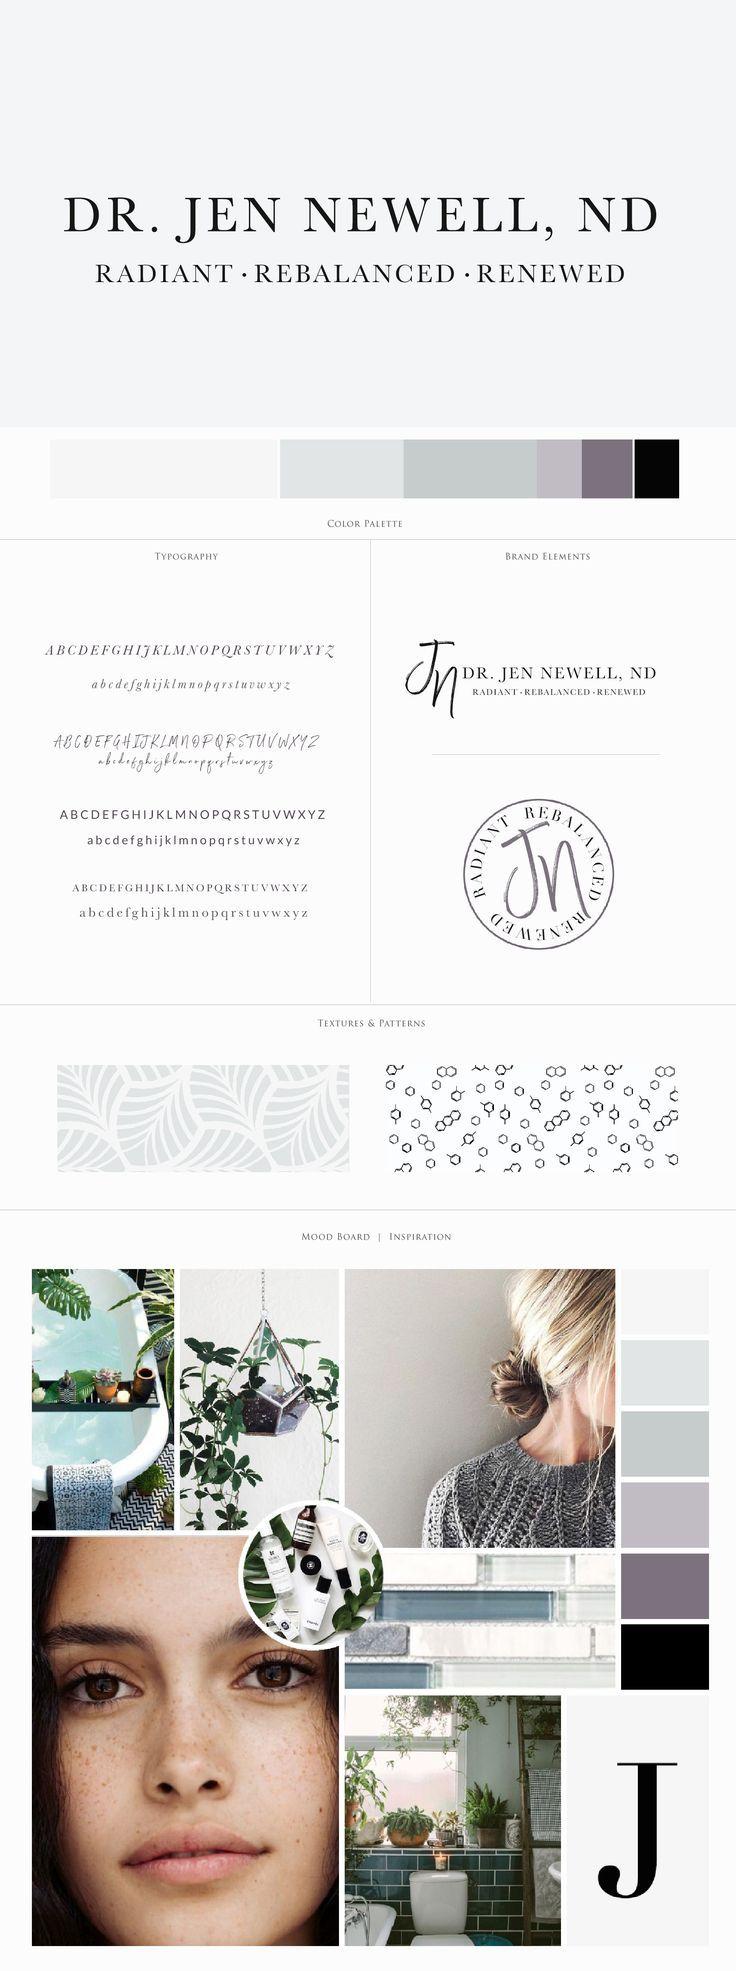 Brandnewell Designs: Dr. Jen Newell Brand Design By Harper Maven Design \\ Www